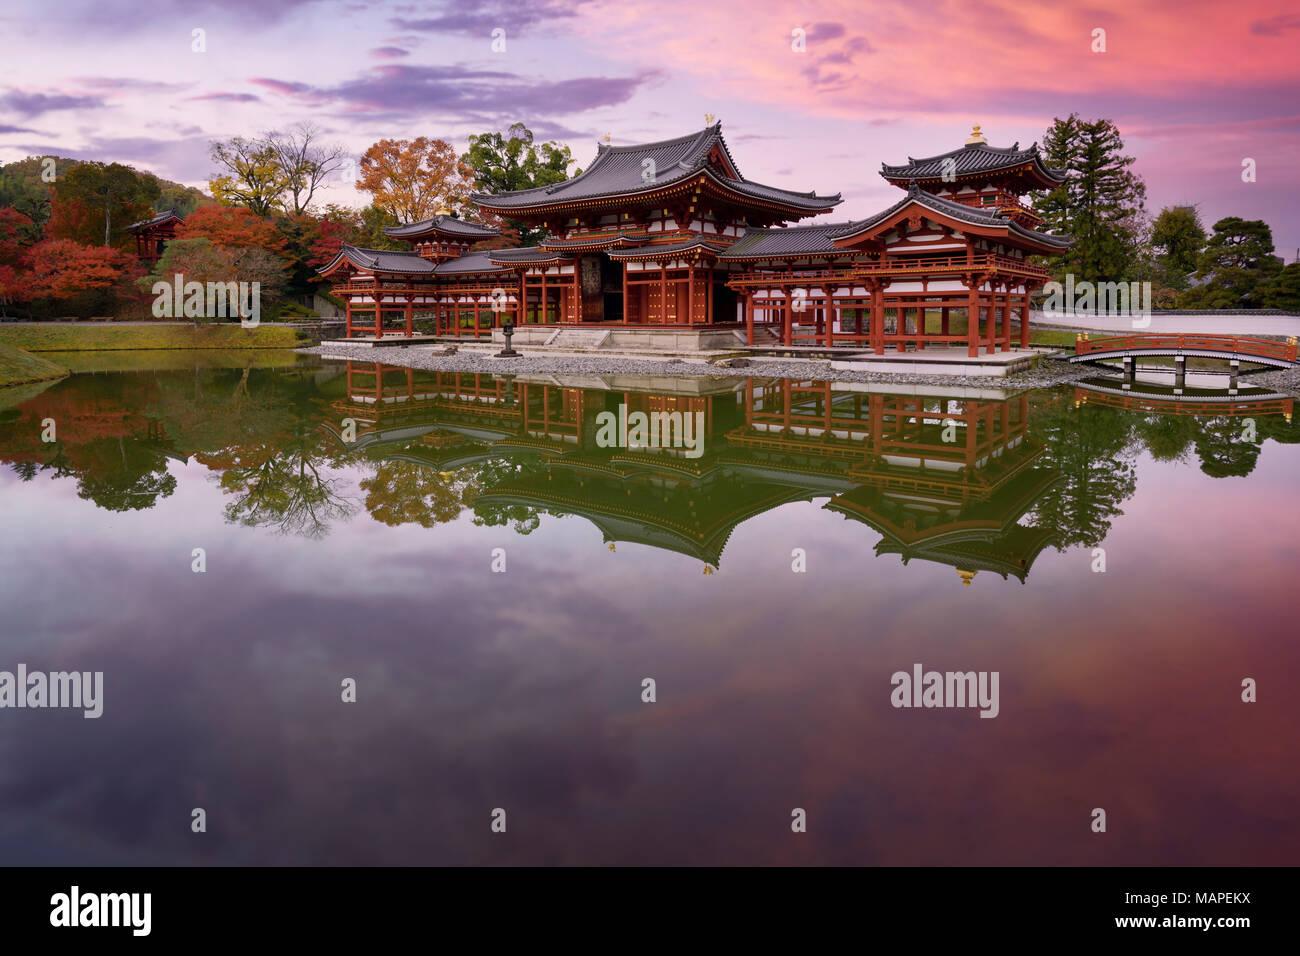 Automne paisible paysage de la Phoenix Hall, hall d'Amida temple Byodoin Kojima sur île de Jodoshiki teien Terre Pure, étang de jardin. Kyoto, Uji Prefe Photo Stock